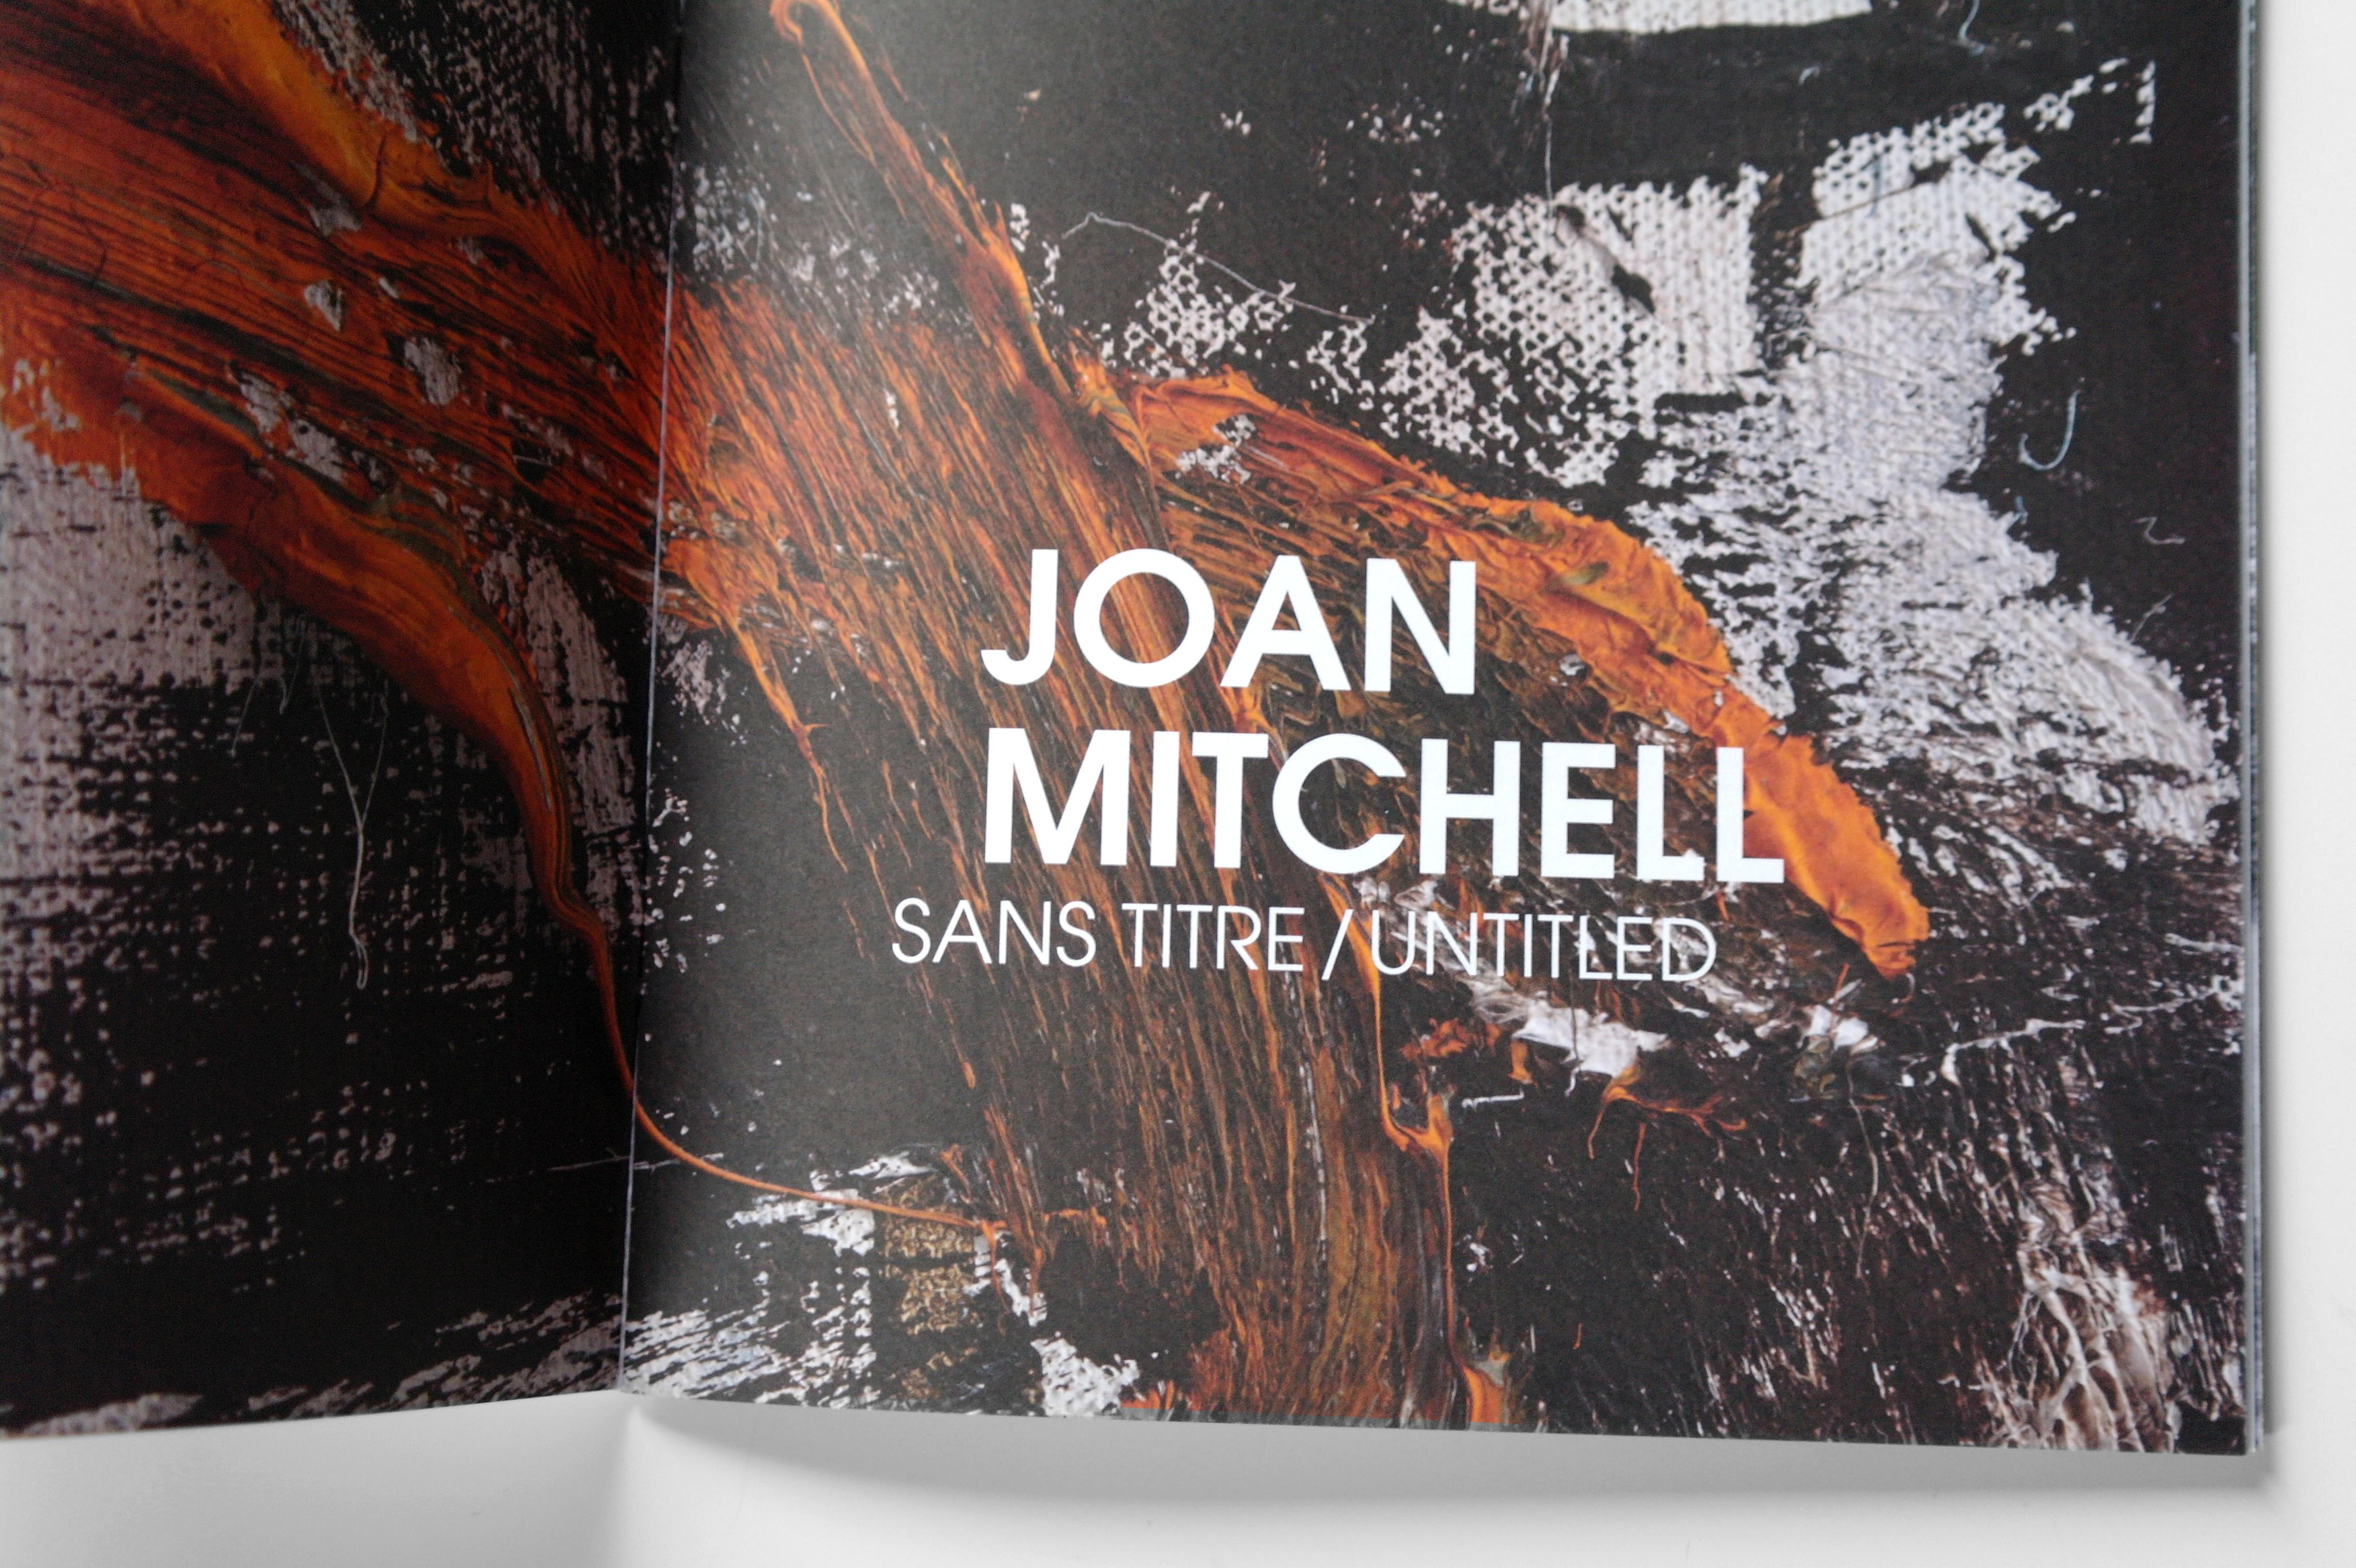 Joan Mitchell